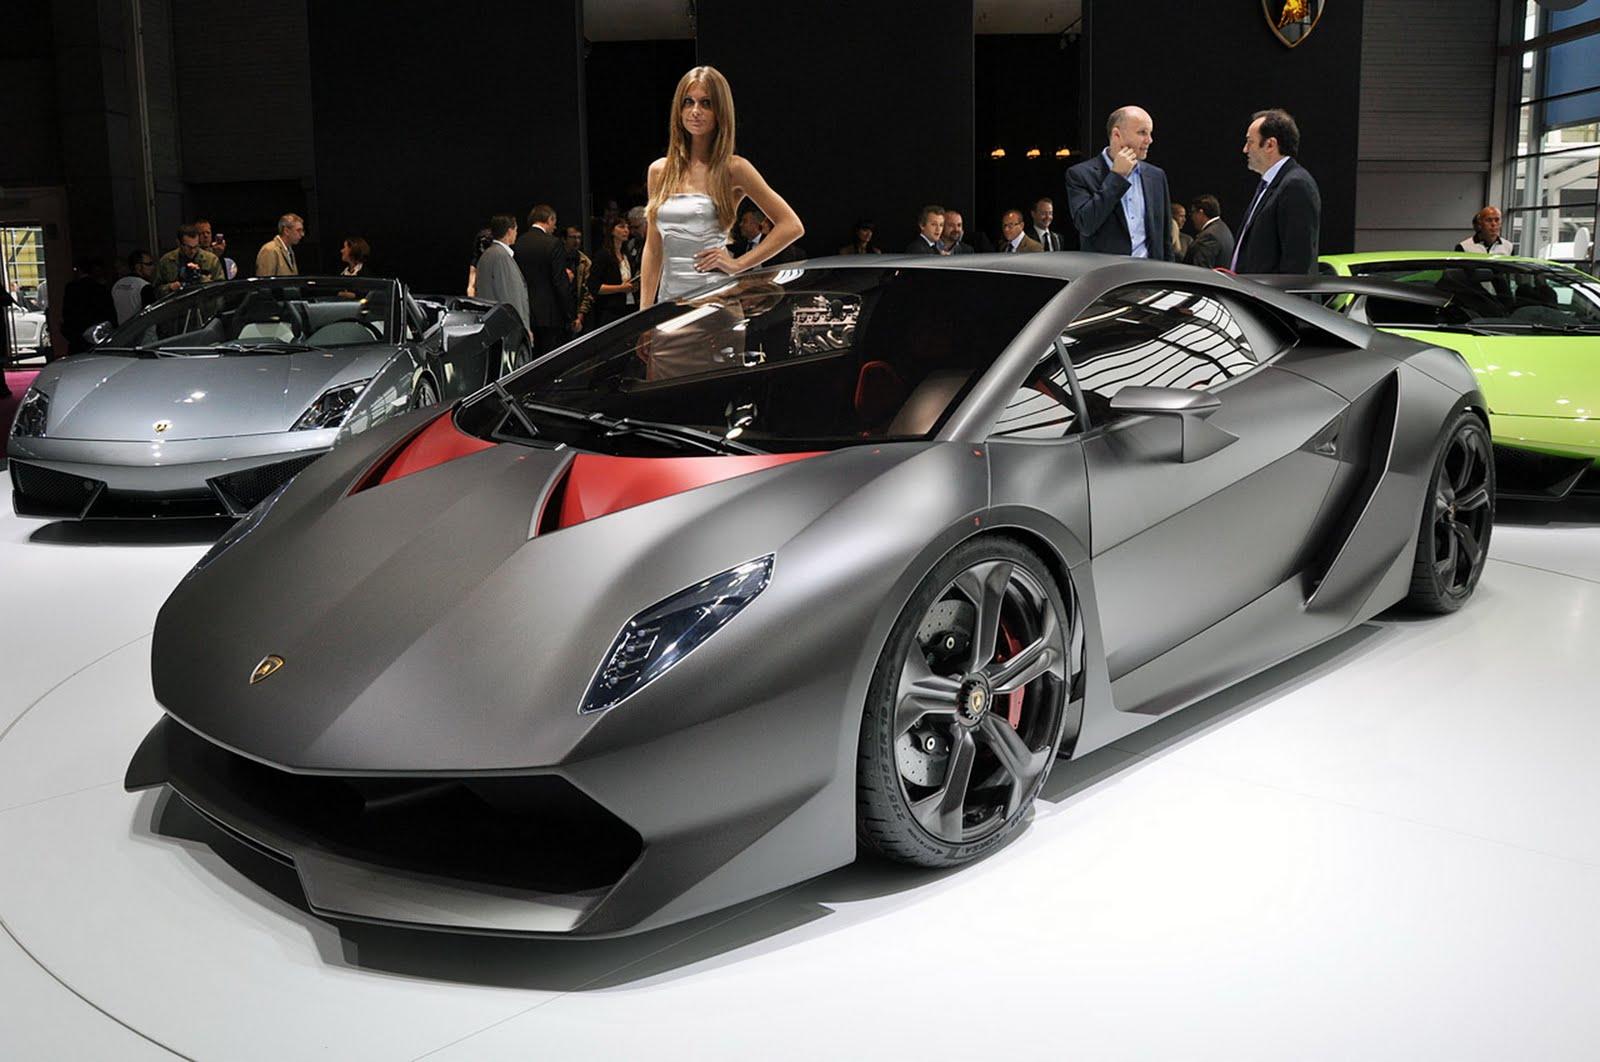 http://2.bp.blogspot.com/-d2LCBaqldkw/TcaV4odxseI/AAAAAAAABSw/gnEZchxs6jg/s1600/Lamborghini-Sesto-Elemento-Wallpaper_0805201104.jpg